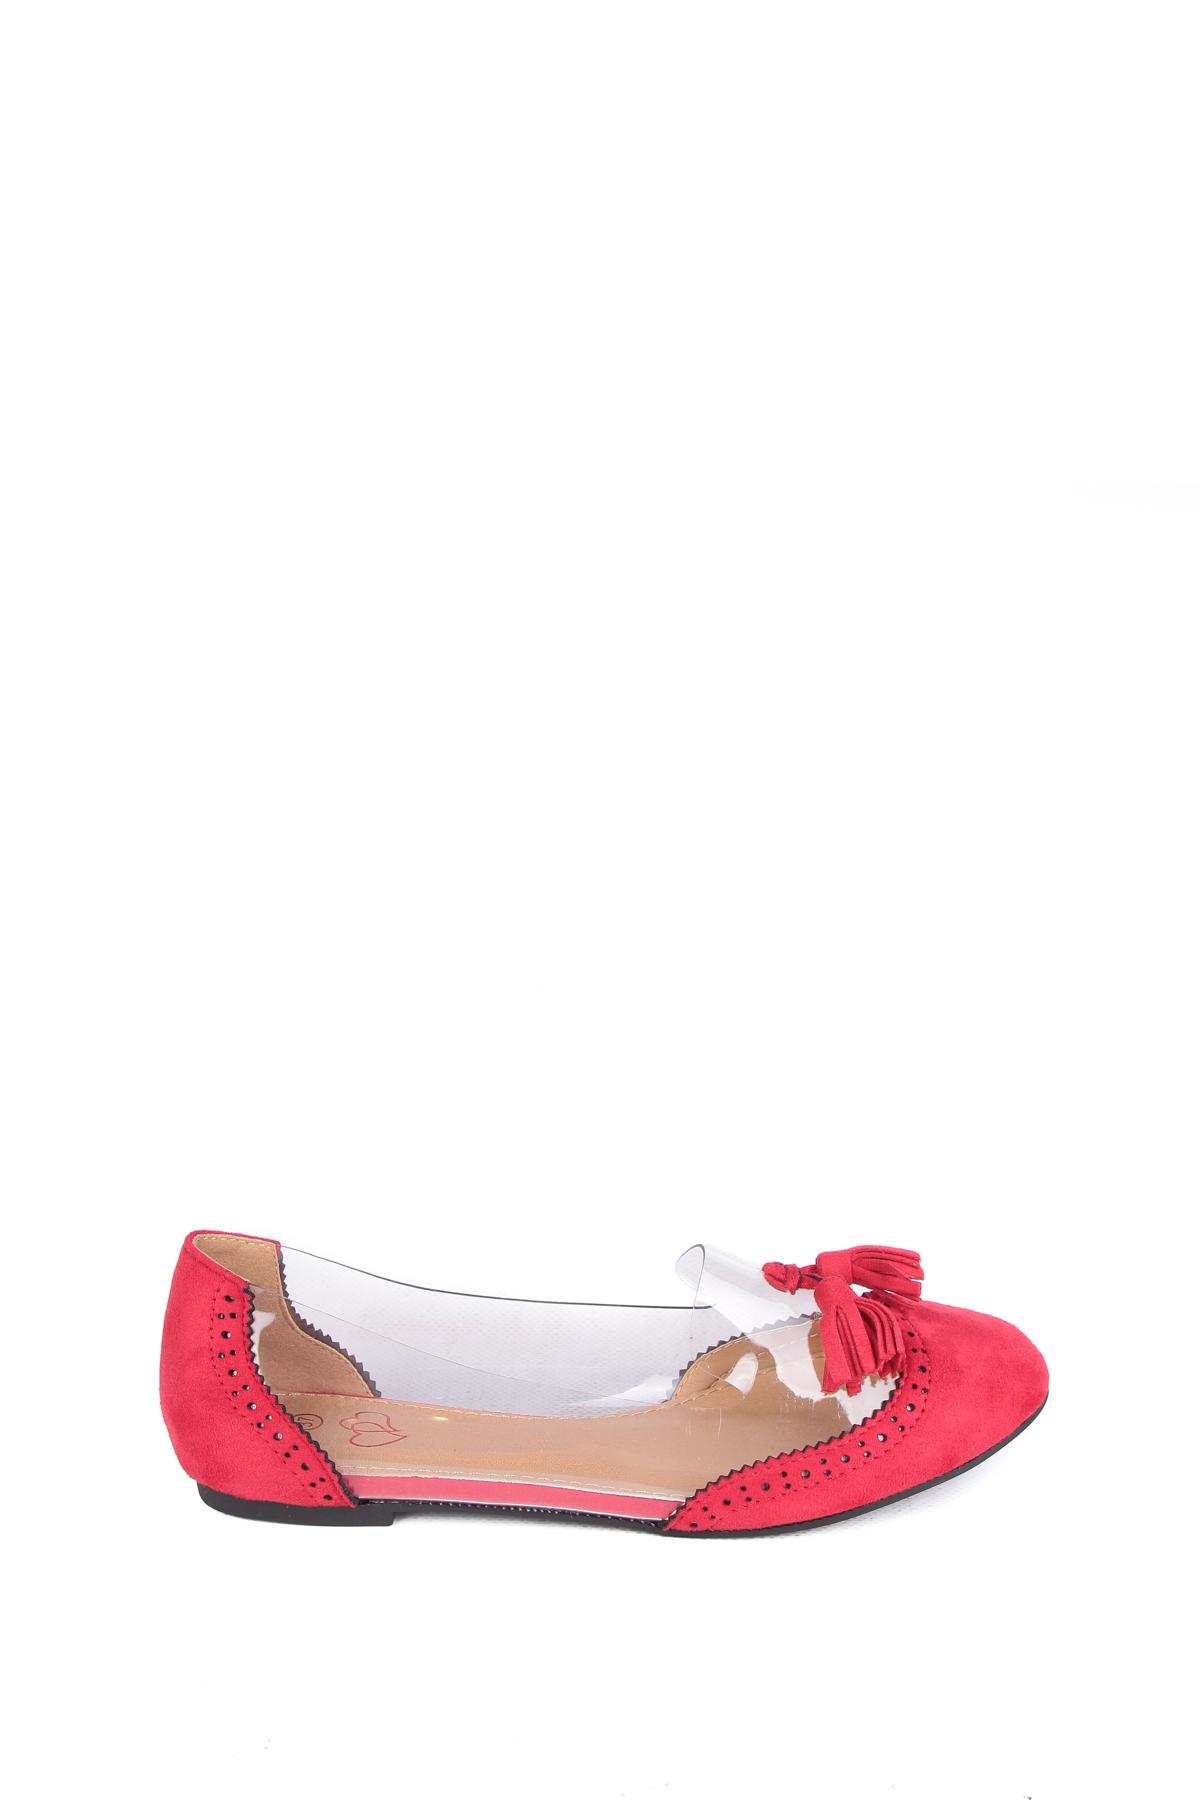 Ballerines Chaussures Rouge WILEDI 617-1 #c eFashion Paris